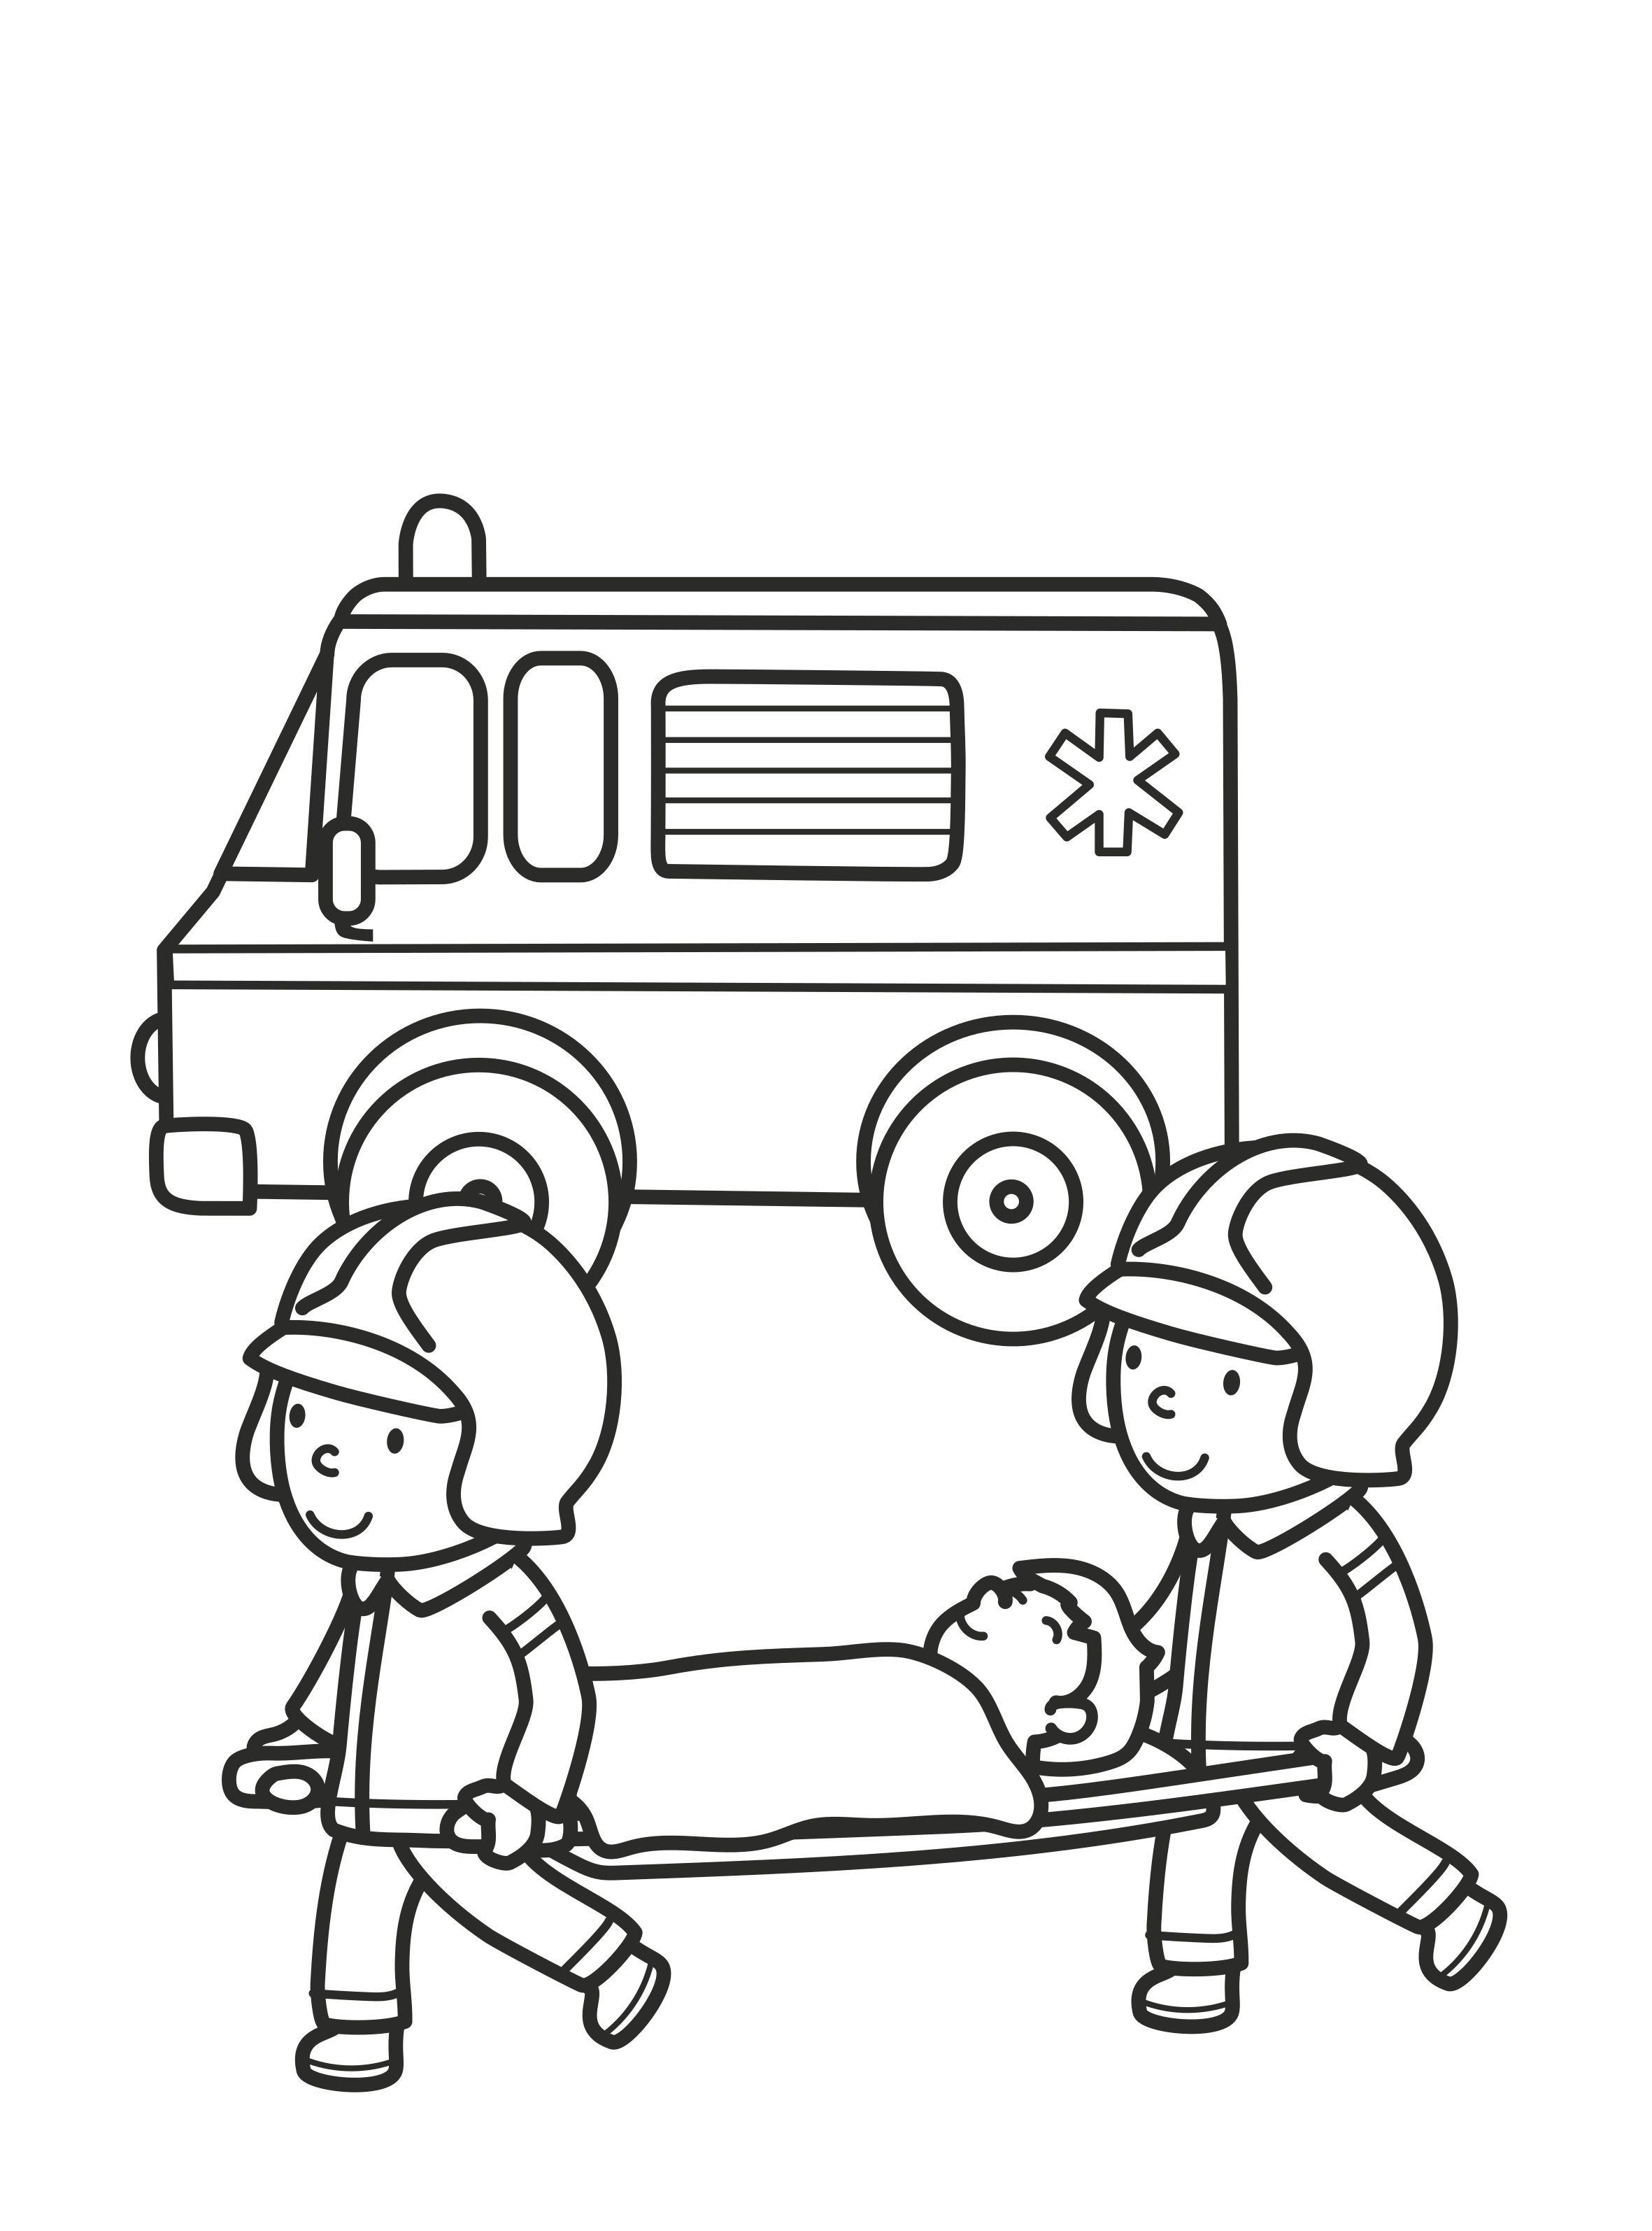 Kleurplaat Ambulance Kleurplaten Knutselen Kleurboek